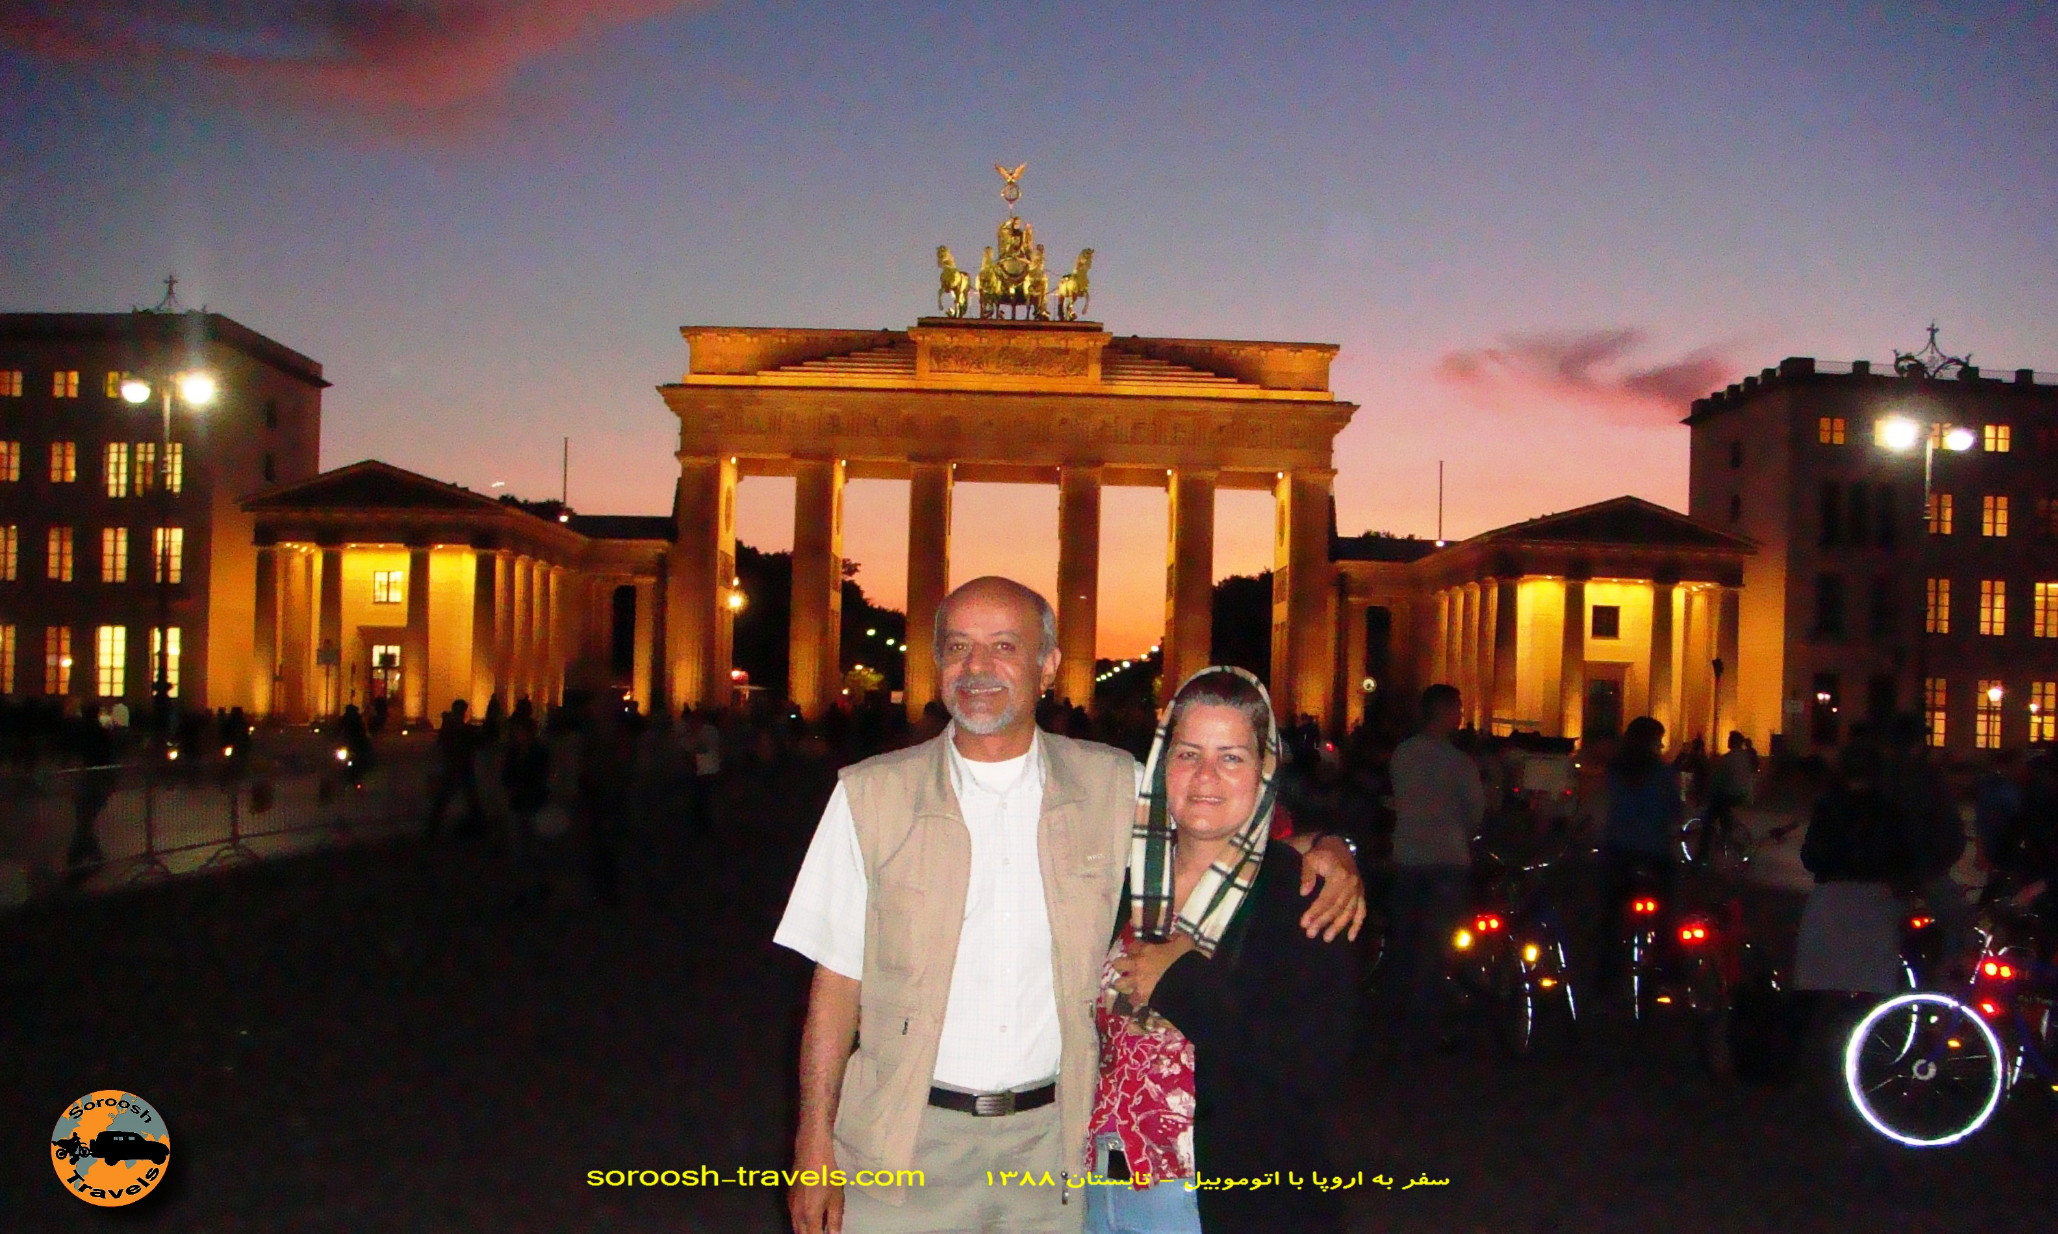 47-27-shahrivar-18-september-hamburg-to-berlin-14